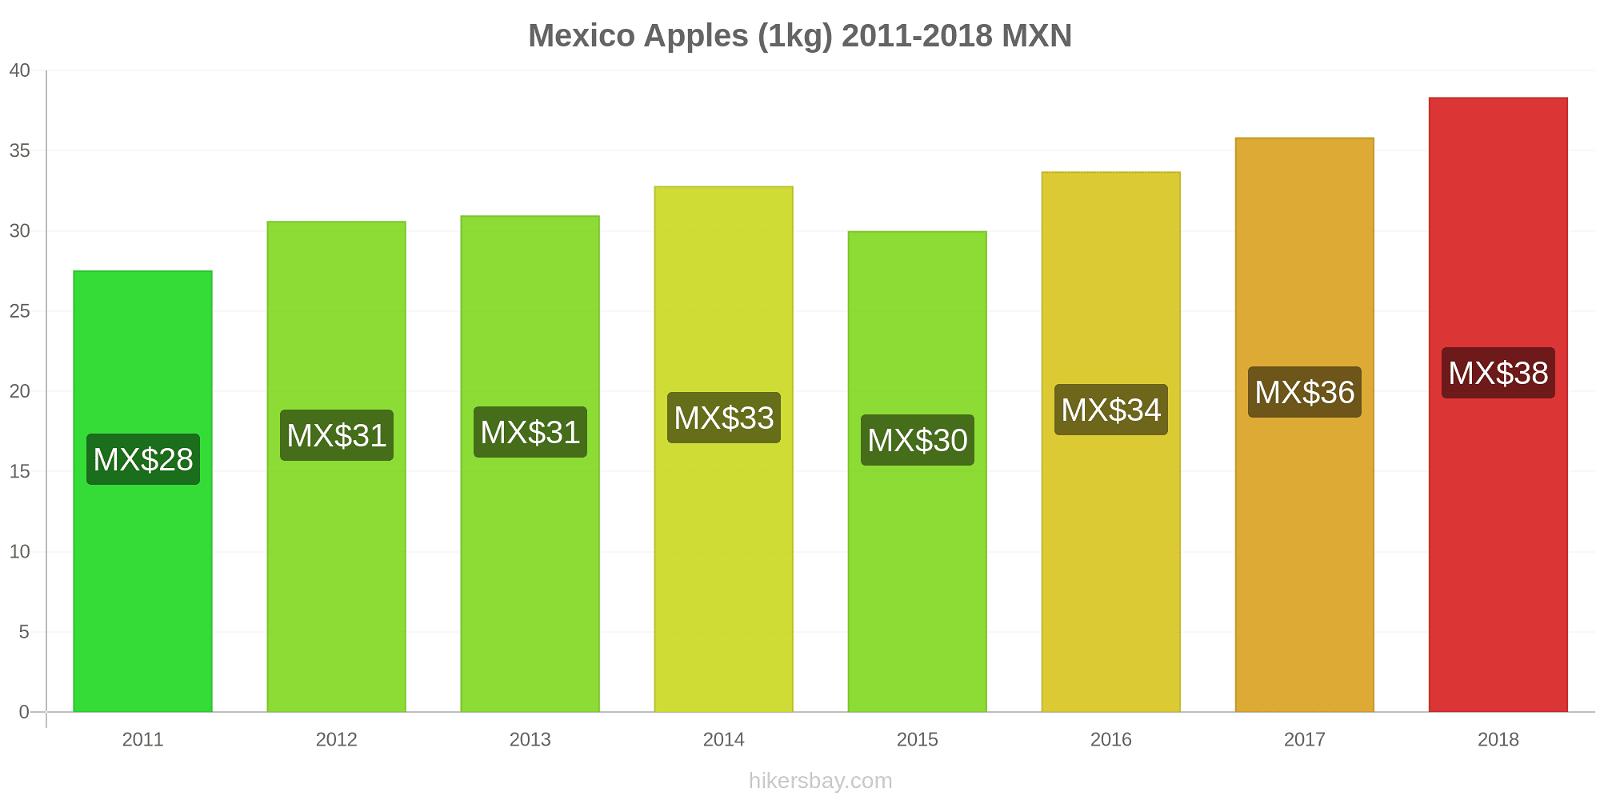 Mexico price changes Apples (1kg) hikersbay.com